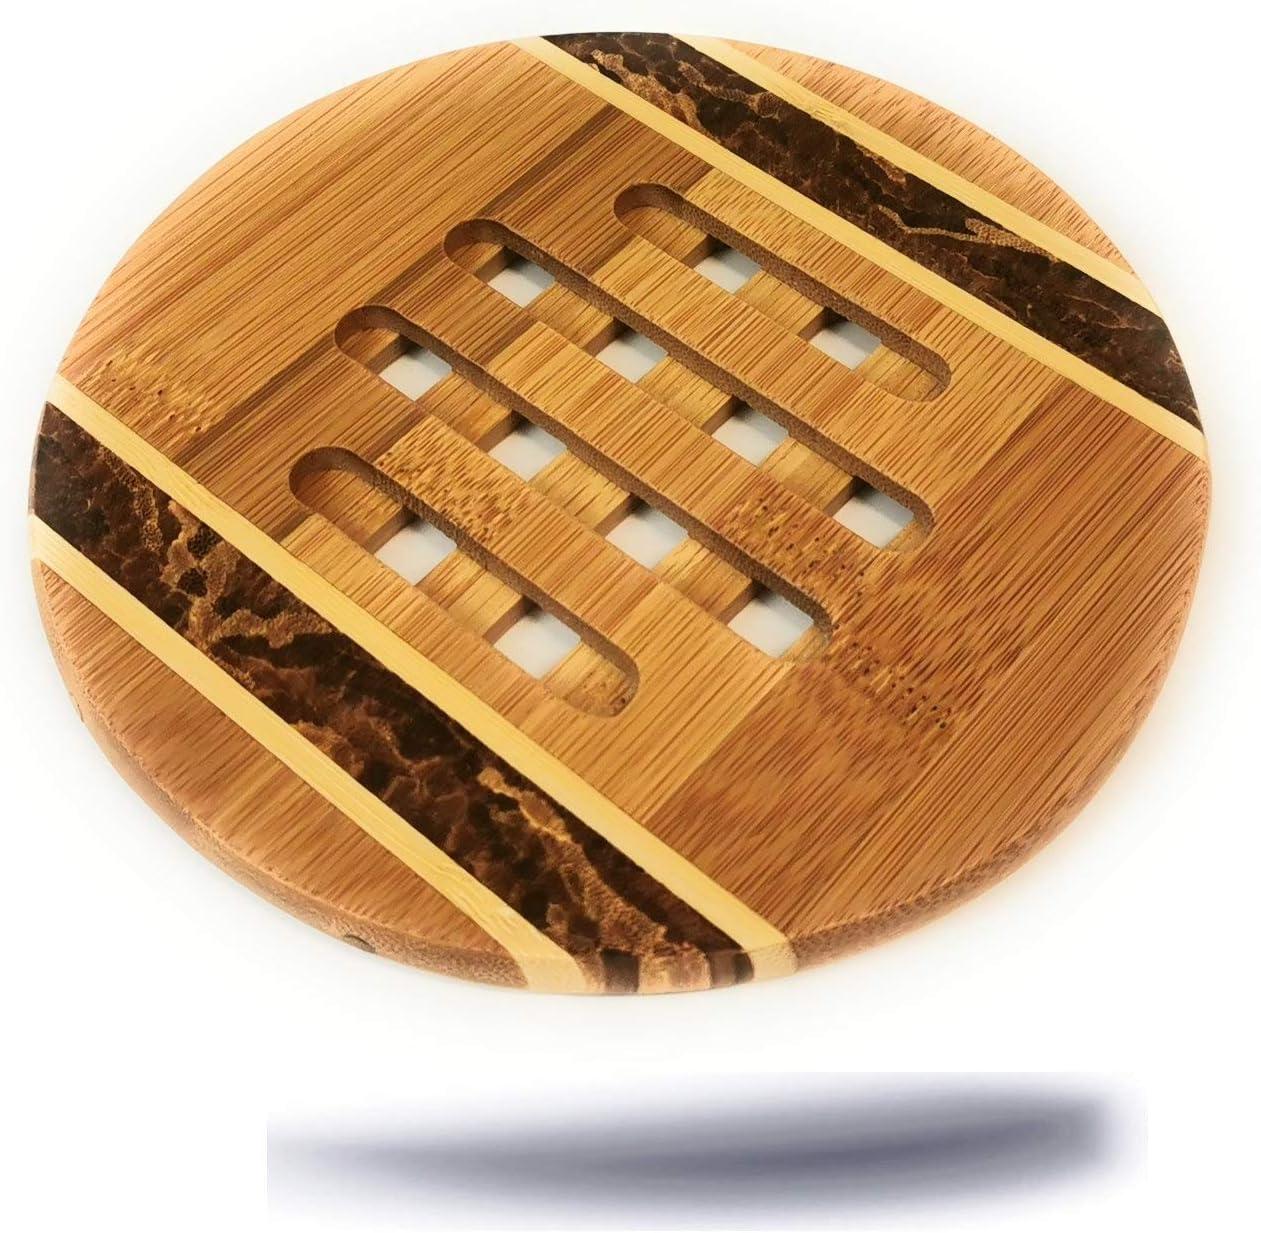 Kerafactum - Elegante posavasos decorativo de madera natural de bambú, redondo, diámetro de 16 cm, para macetas, jarrones, calderas, salvamanteles de bambú, madera de bambú